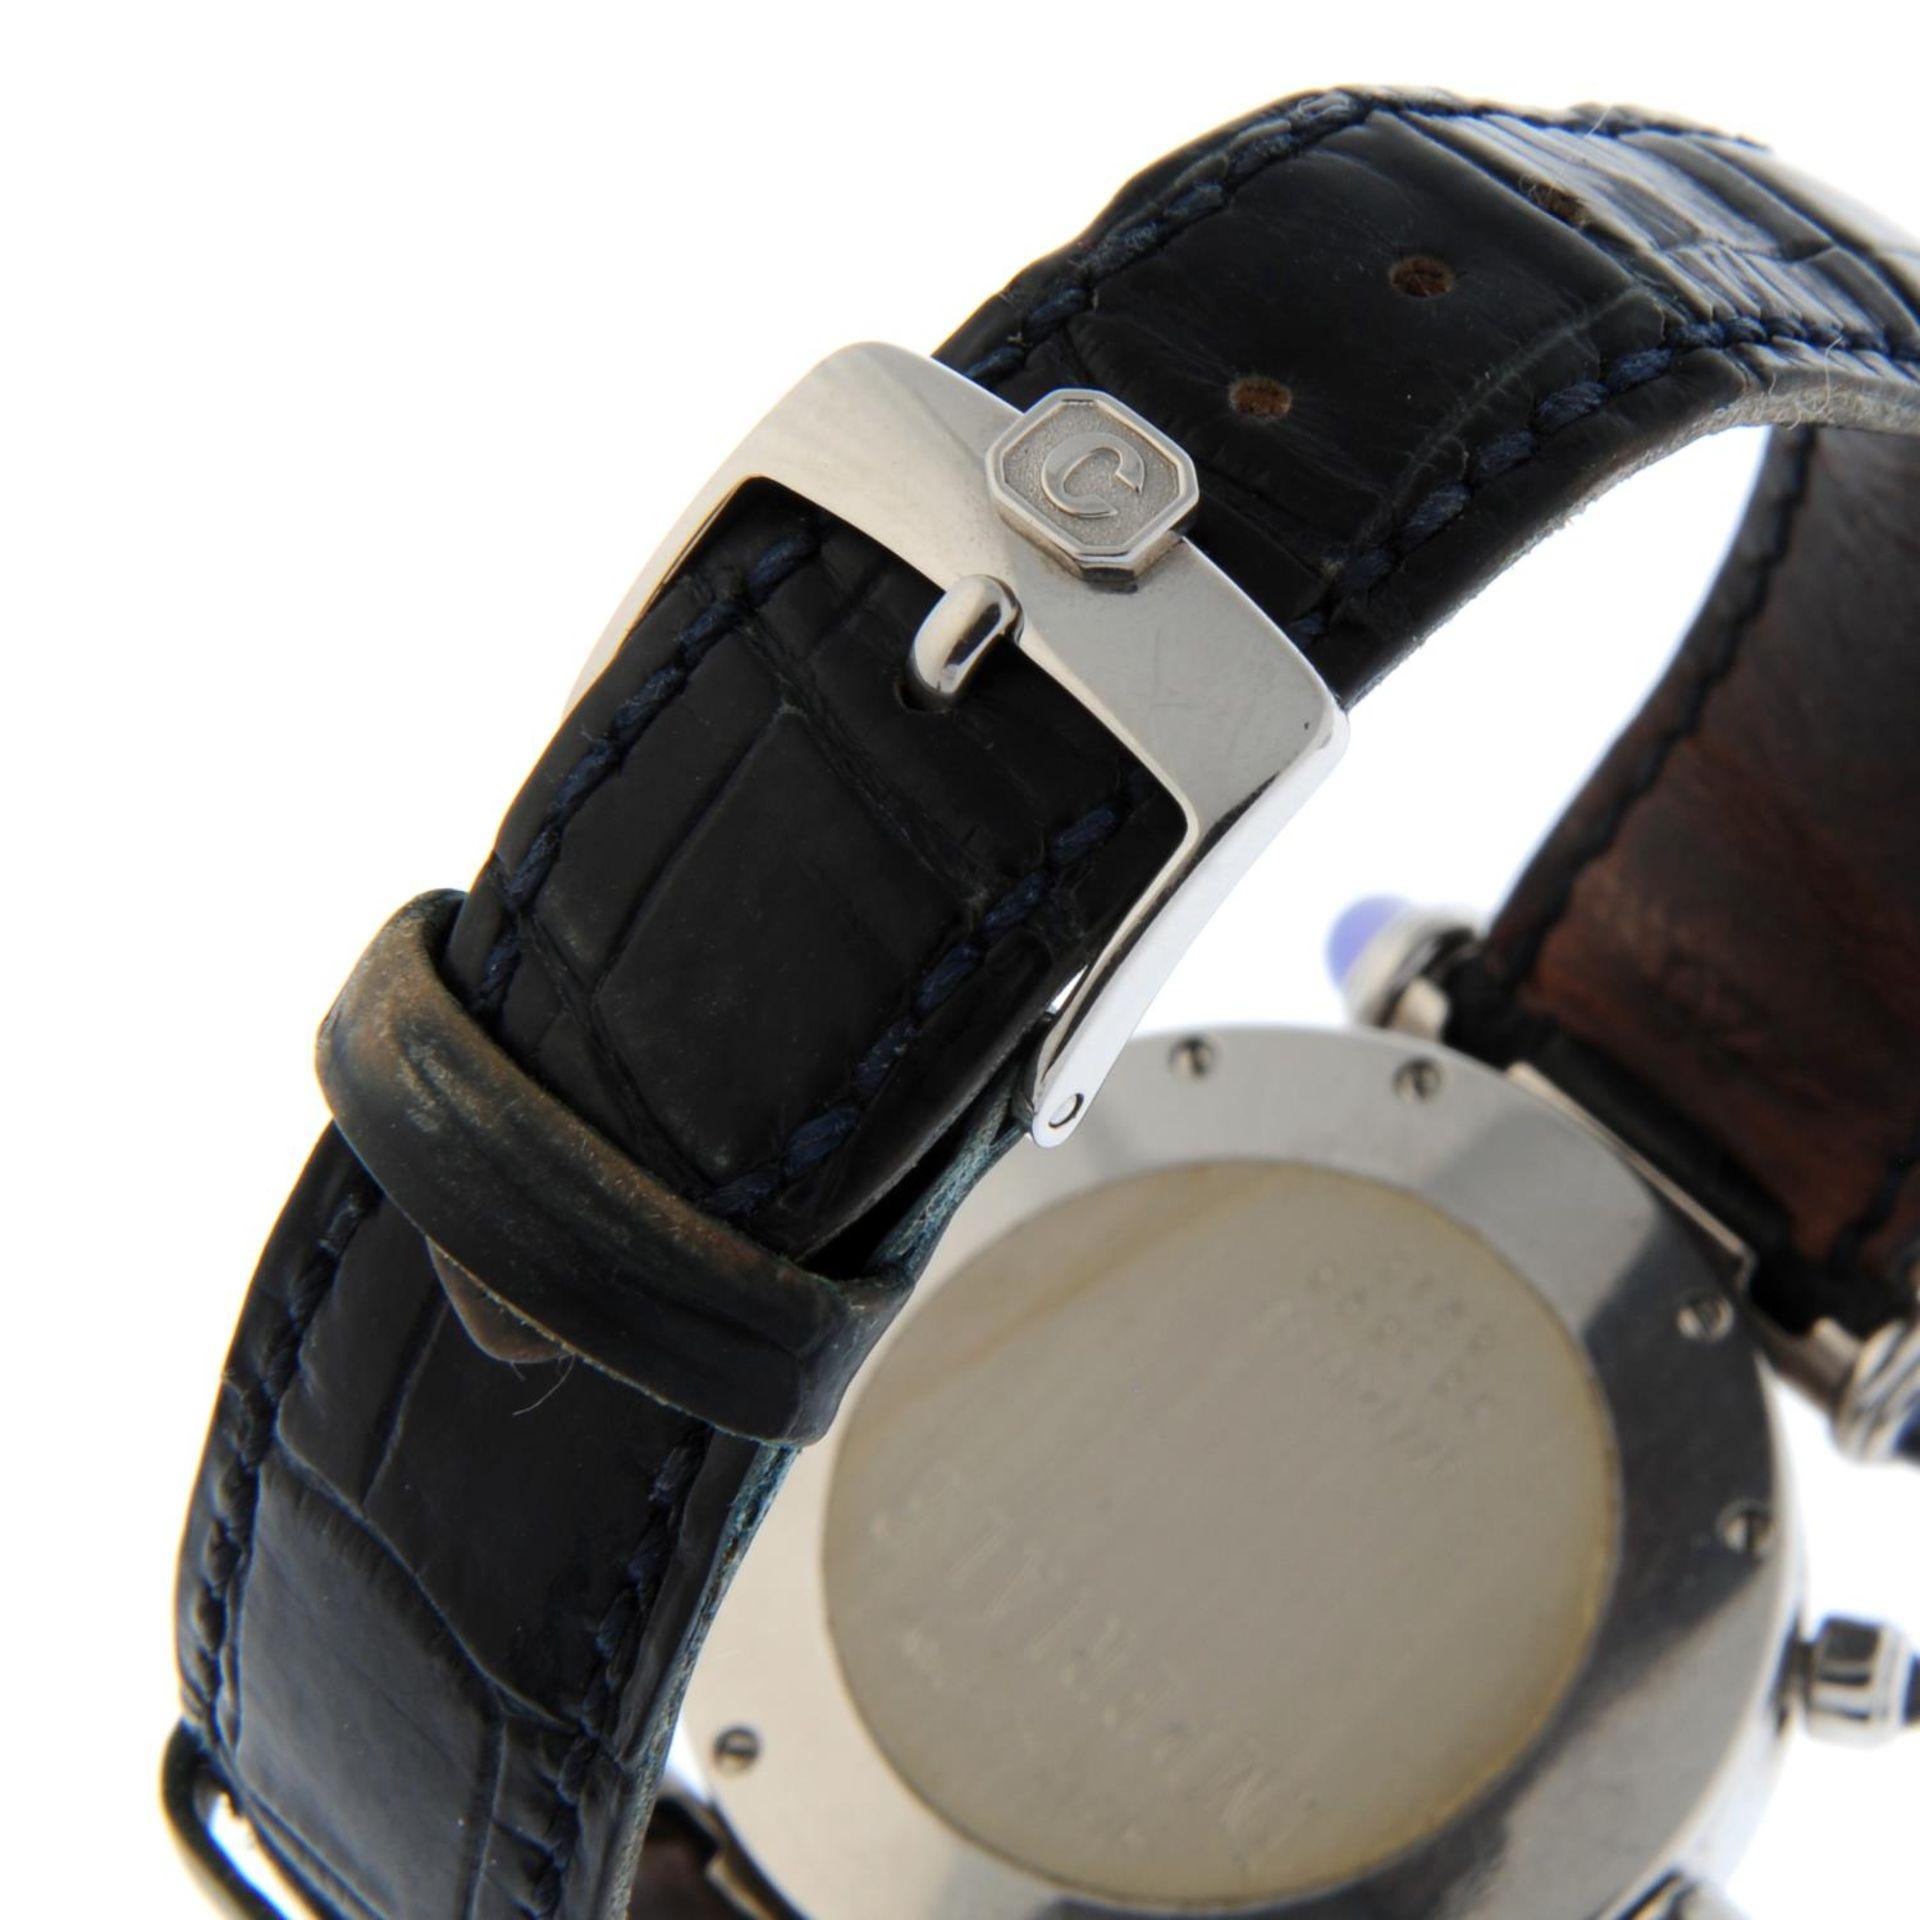 CHOPARD - an Imperiale chronograph wrist watch. - Bild 2 aus 5